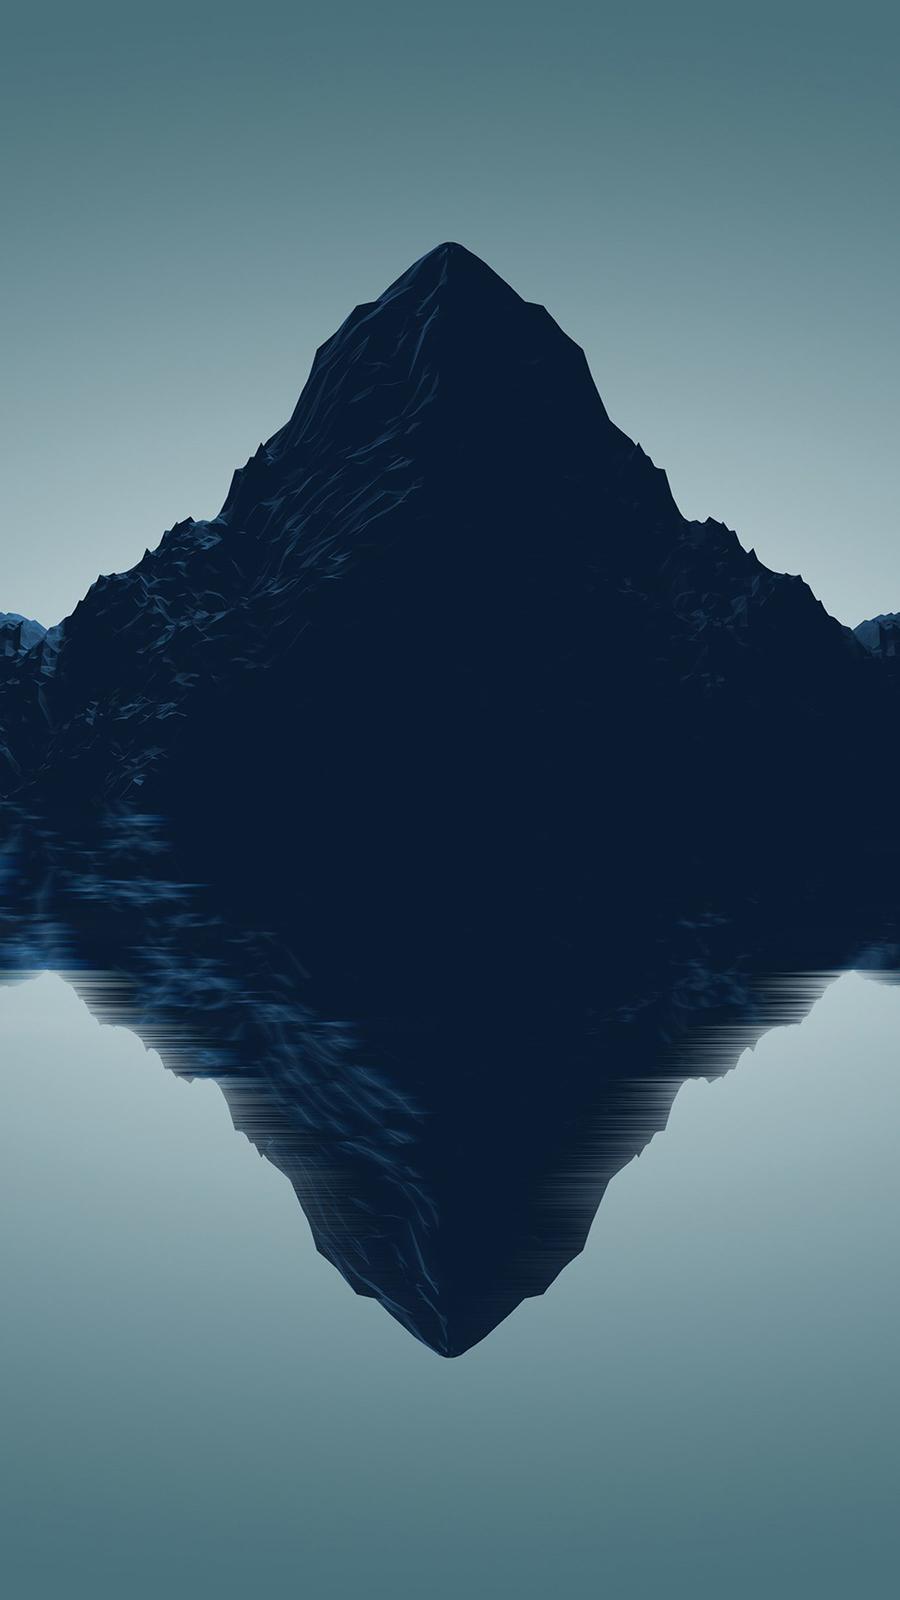 Artistic Mountains Qu Wallpaper